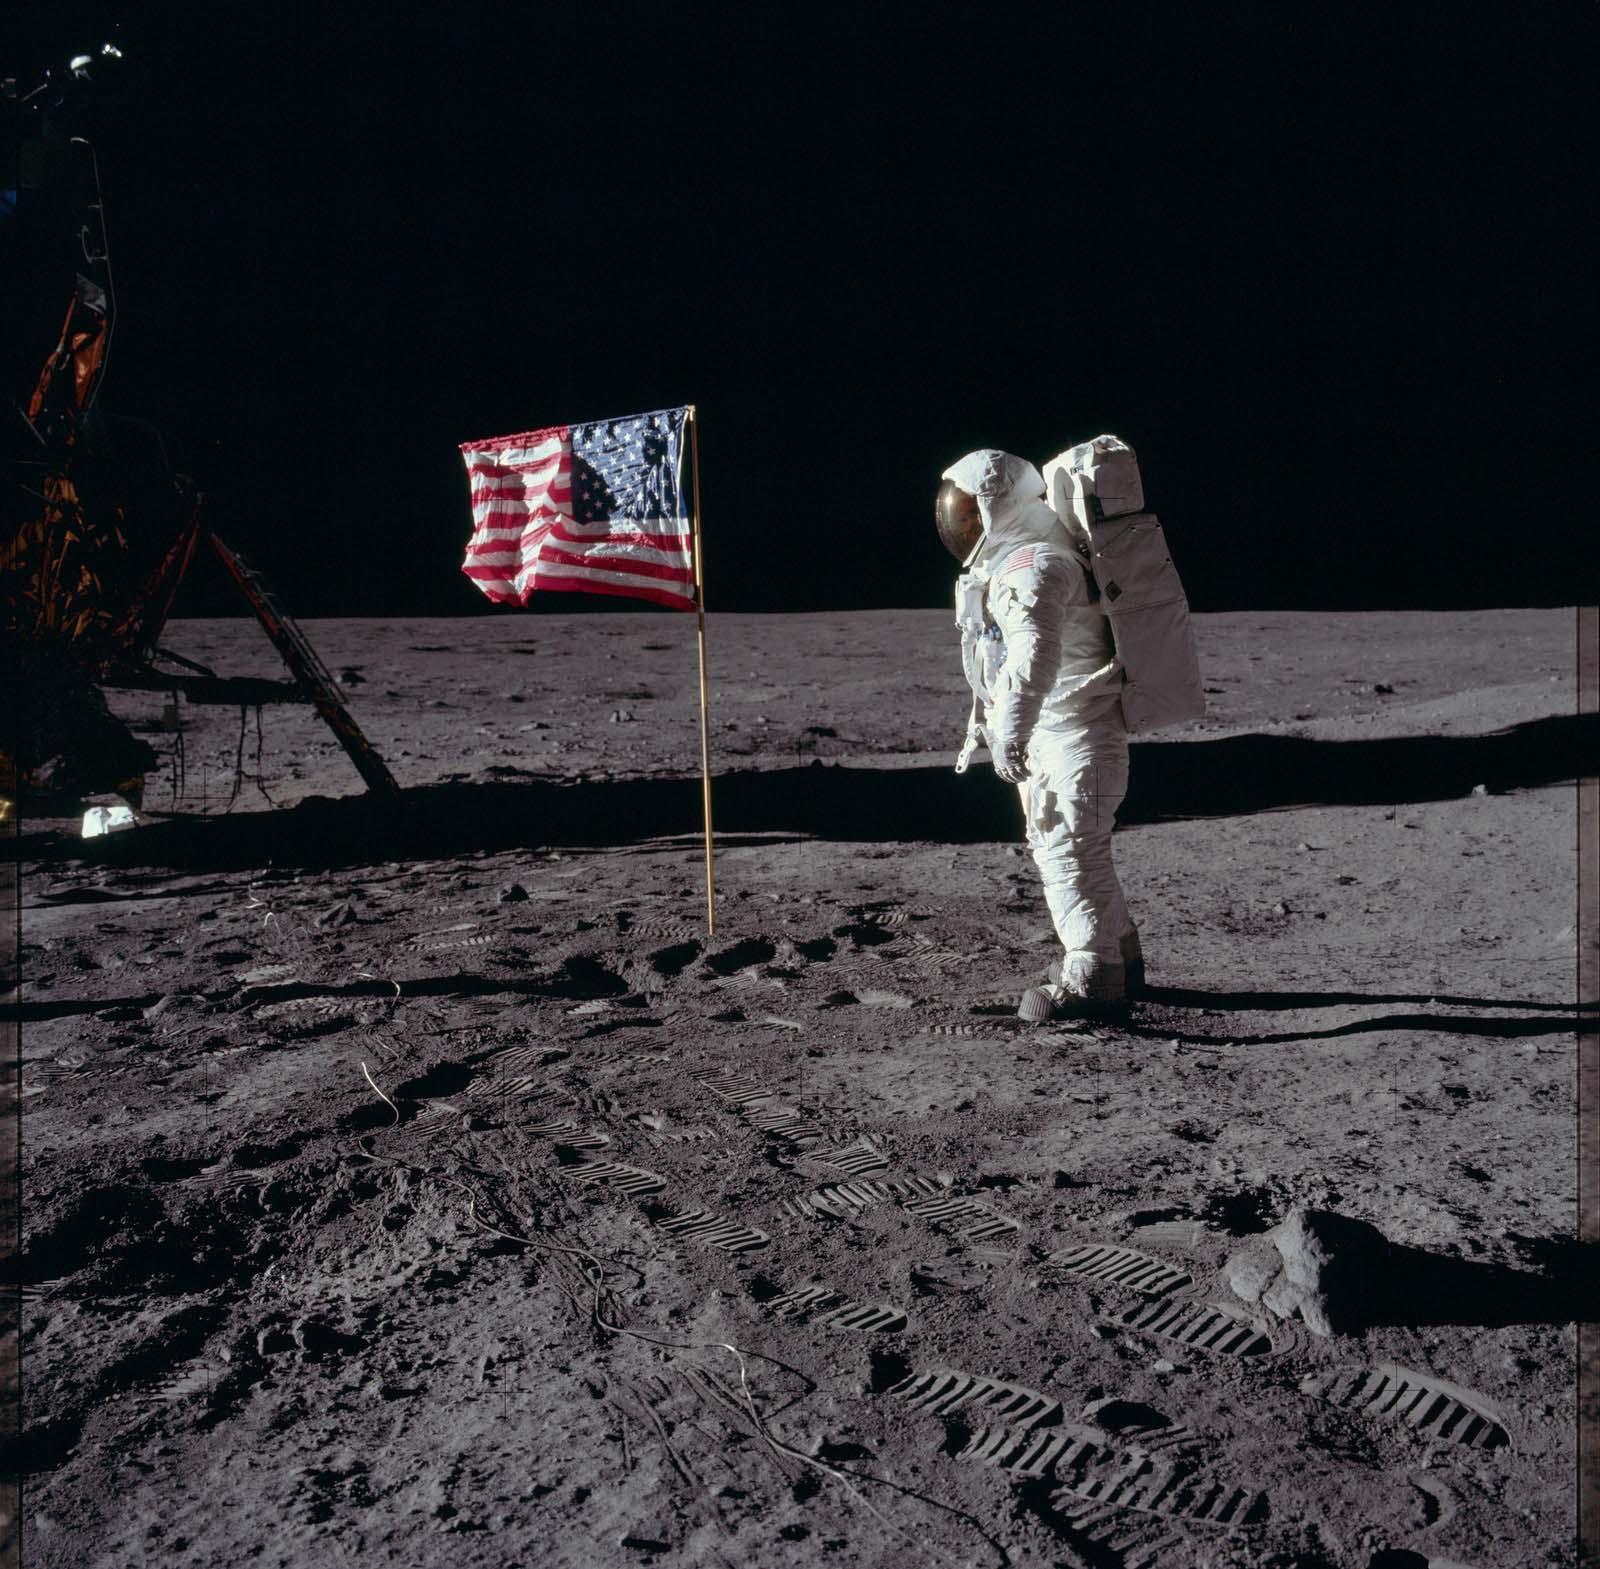 Astronaut Edwin Buzz Aldrin on the surface of the moon, 1969